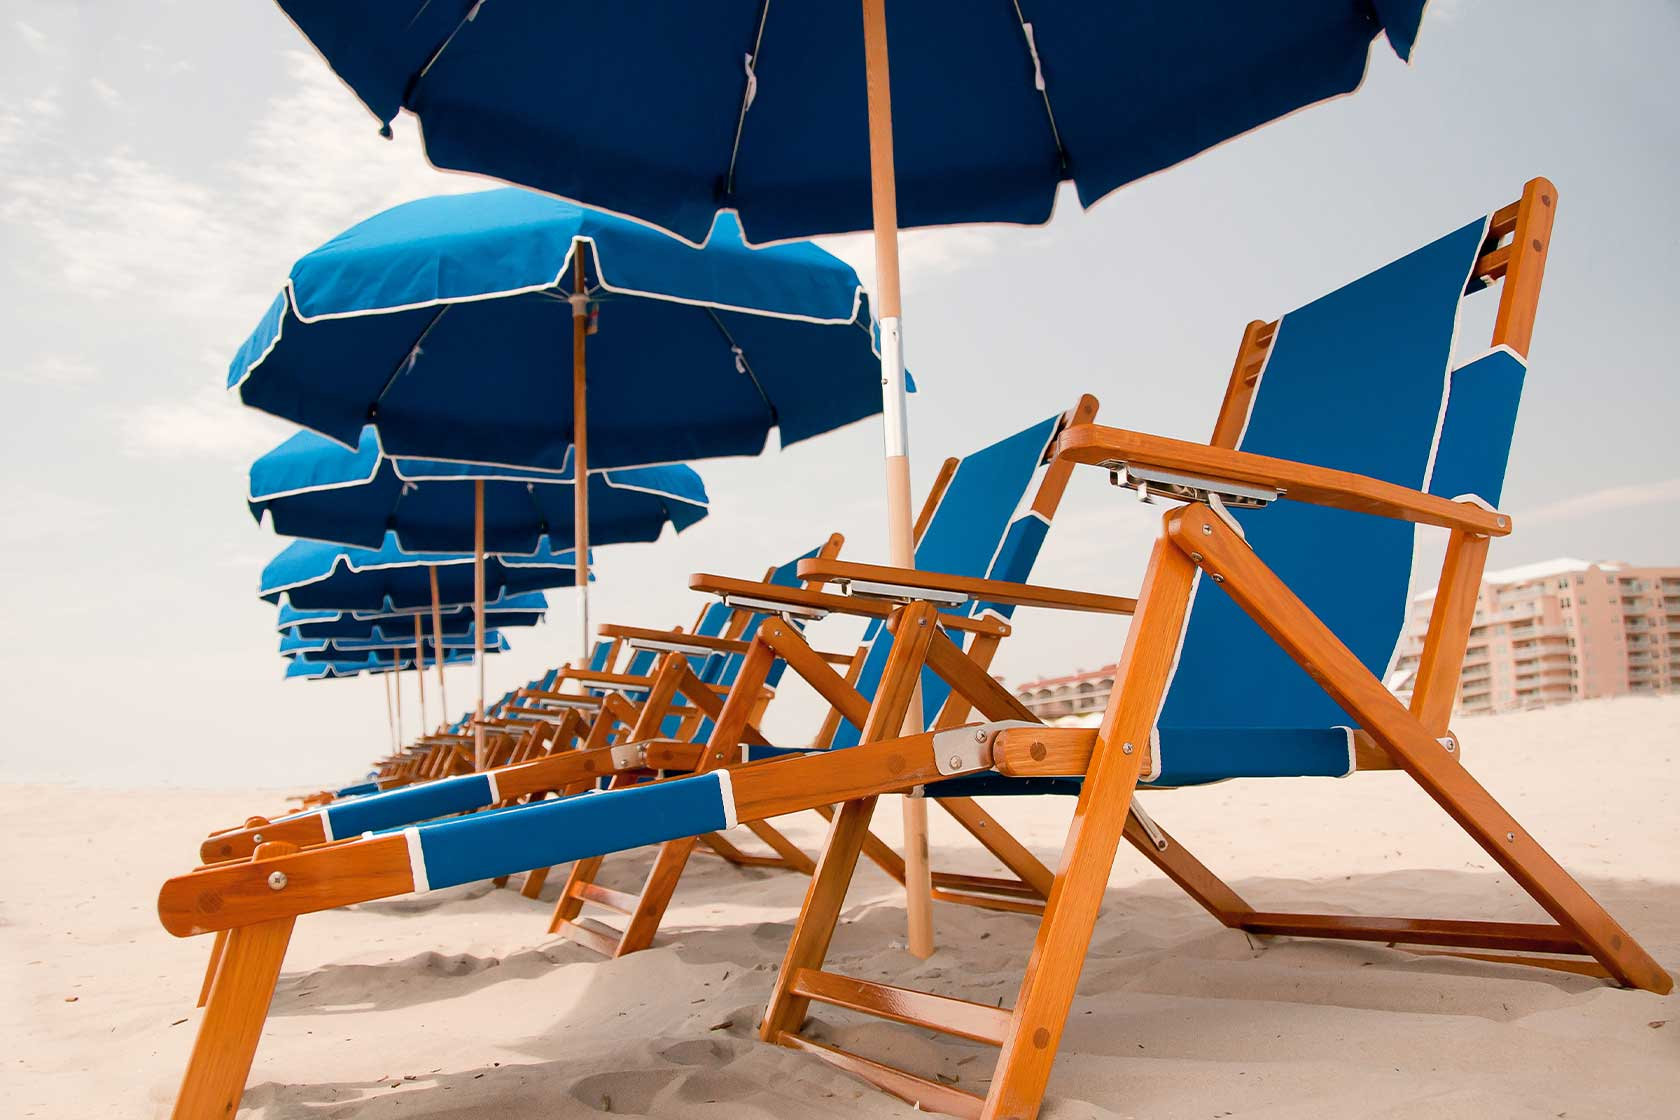 Beach Chair/Lounger Rentals